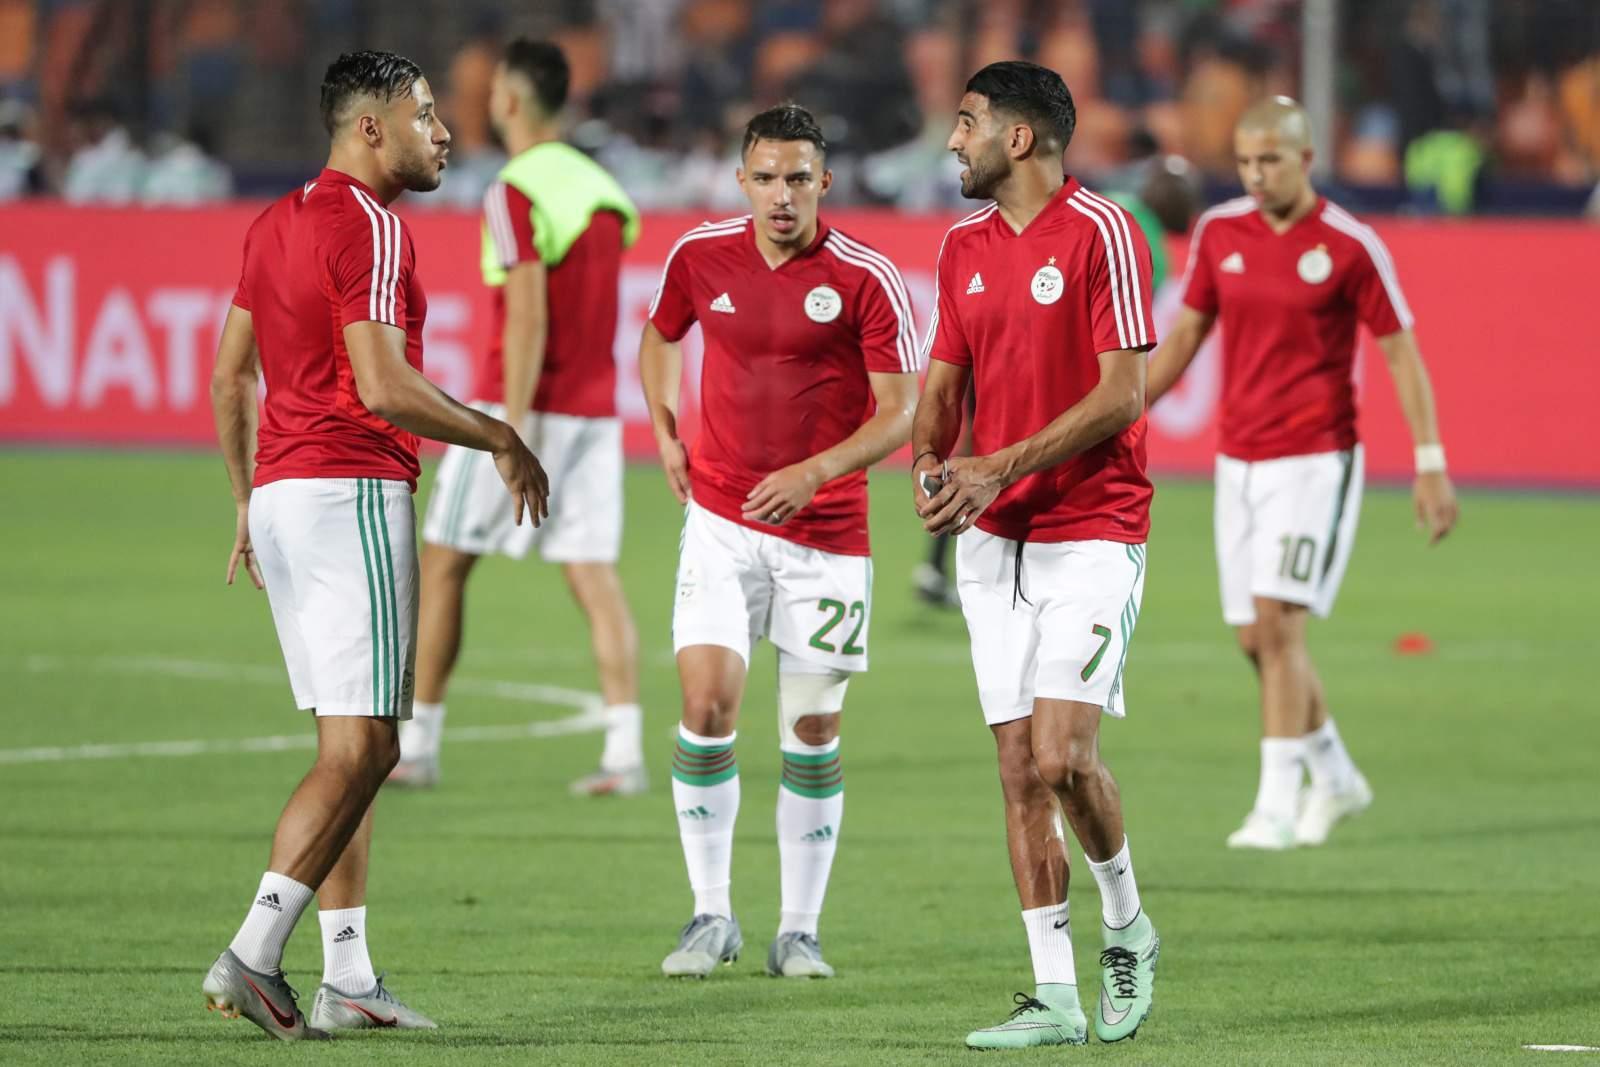 Нигер – Алжир: прогноз на матч отборочного цикла чемпионата мира-2022 - 12 октября 2021